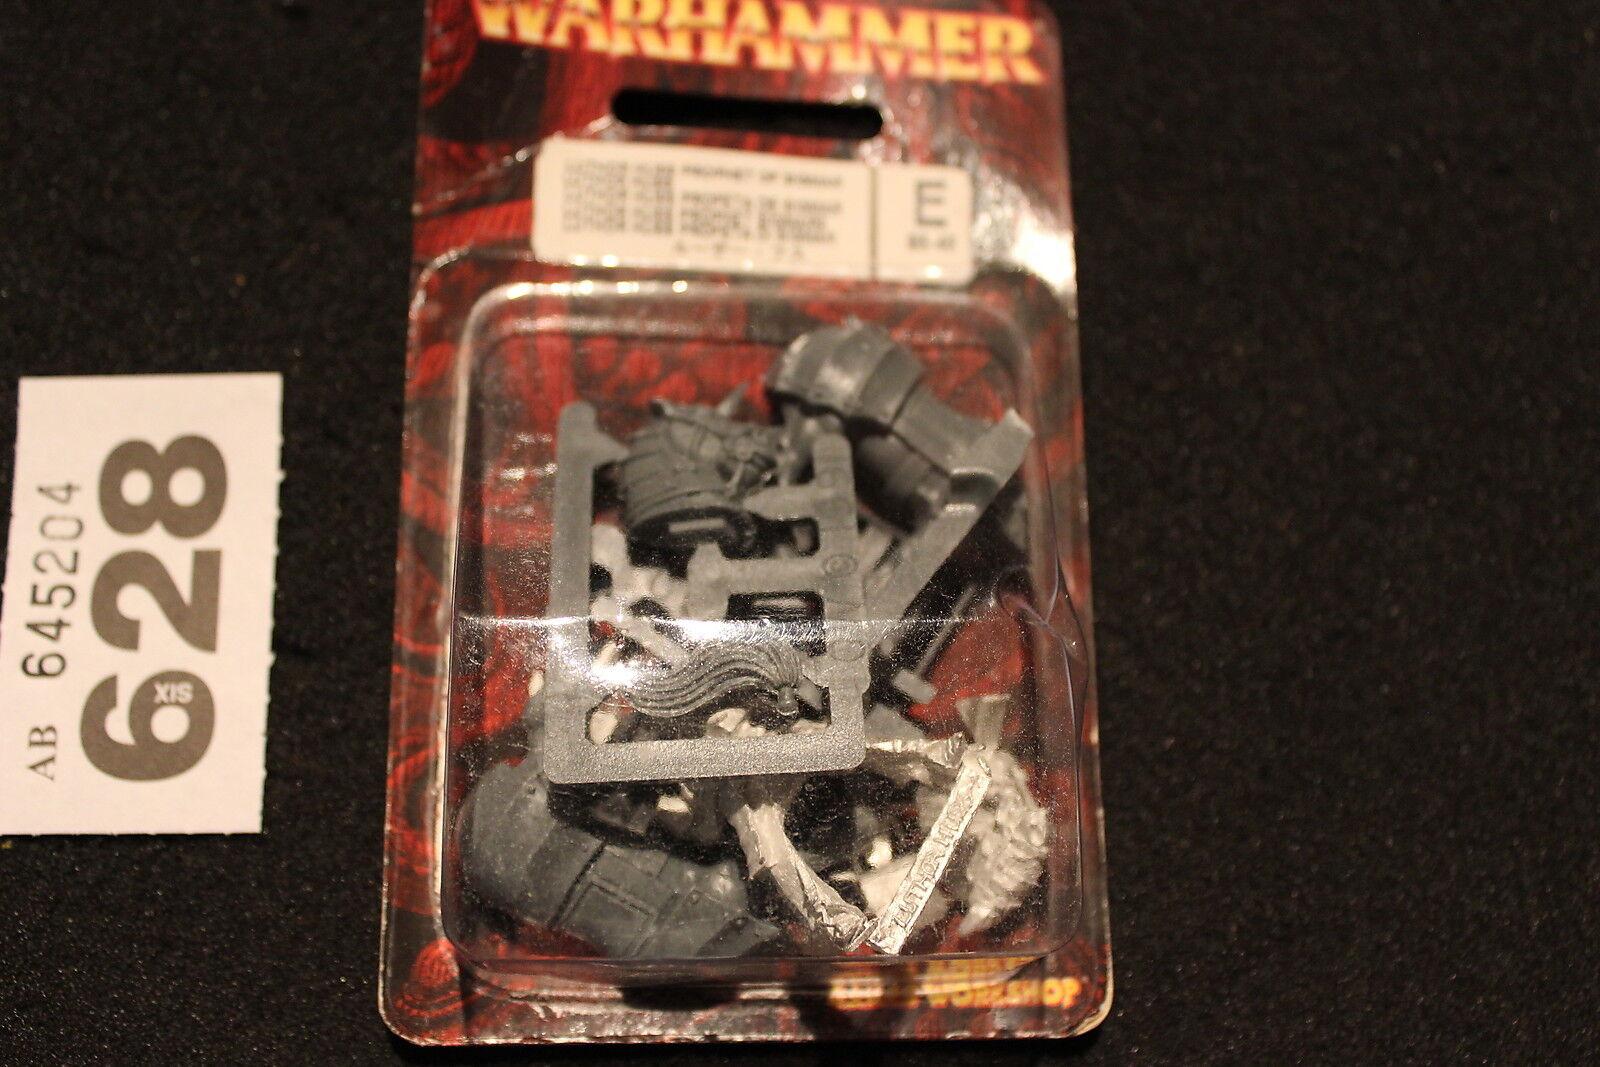 Games Workshop Warhammer Fantasy Luthor Huss Prophet of Sigmar Empire BNIB New